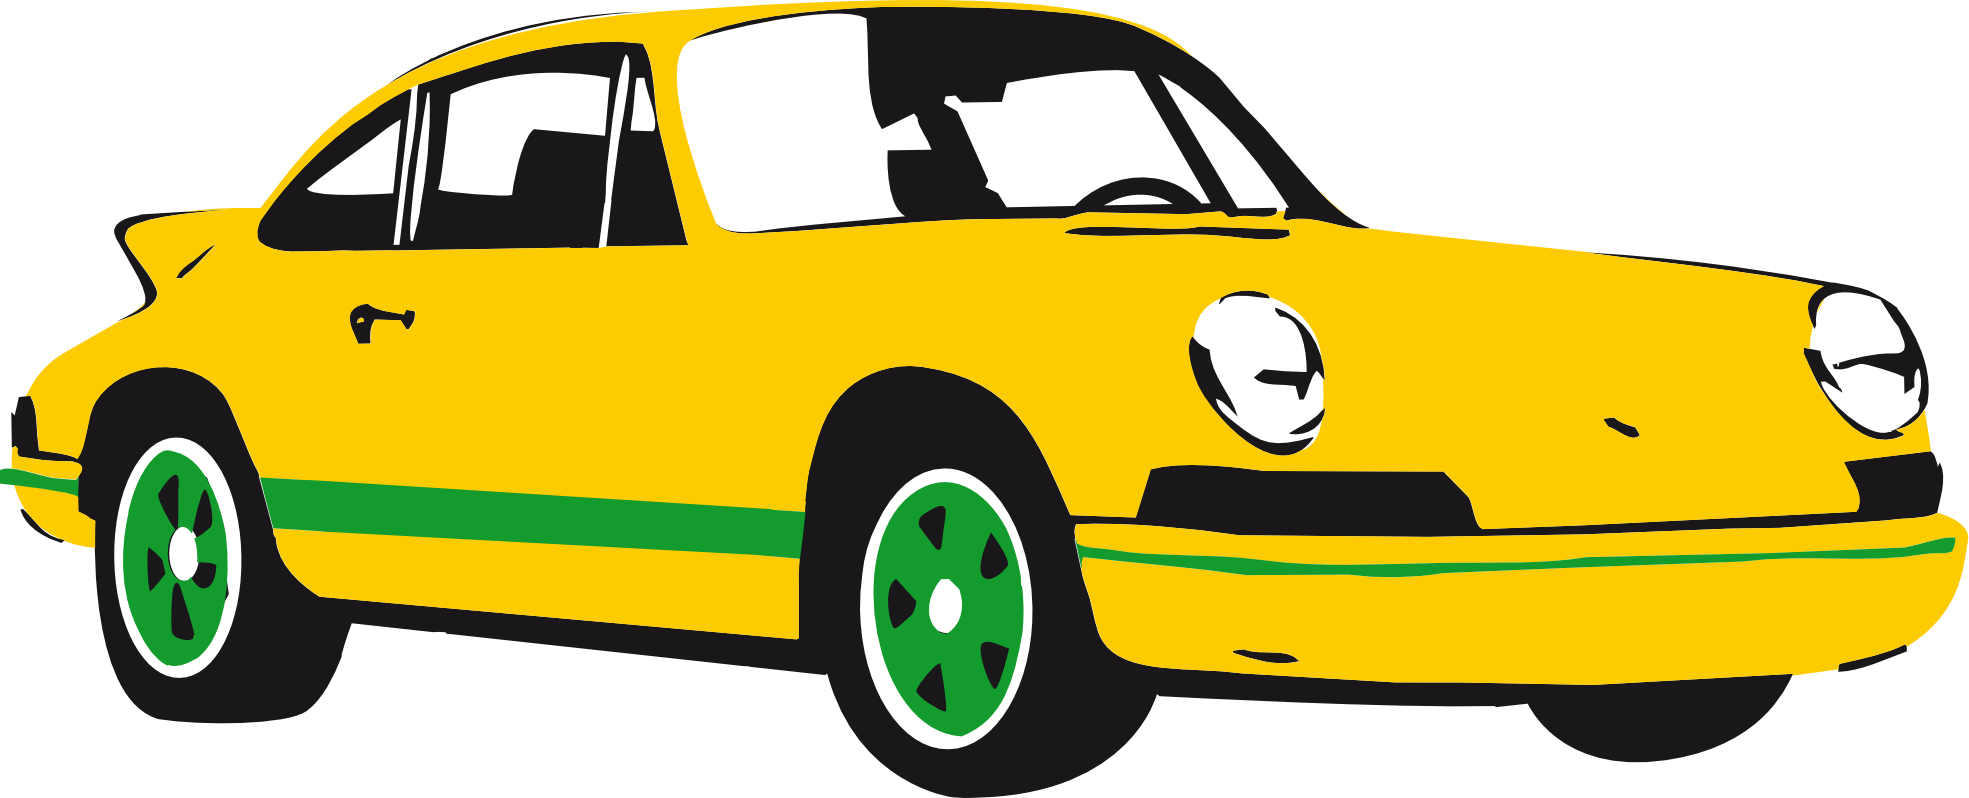 clip transparent stock Clip art sport panda. Car clipart yellow.